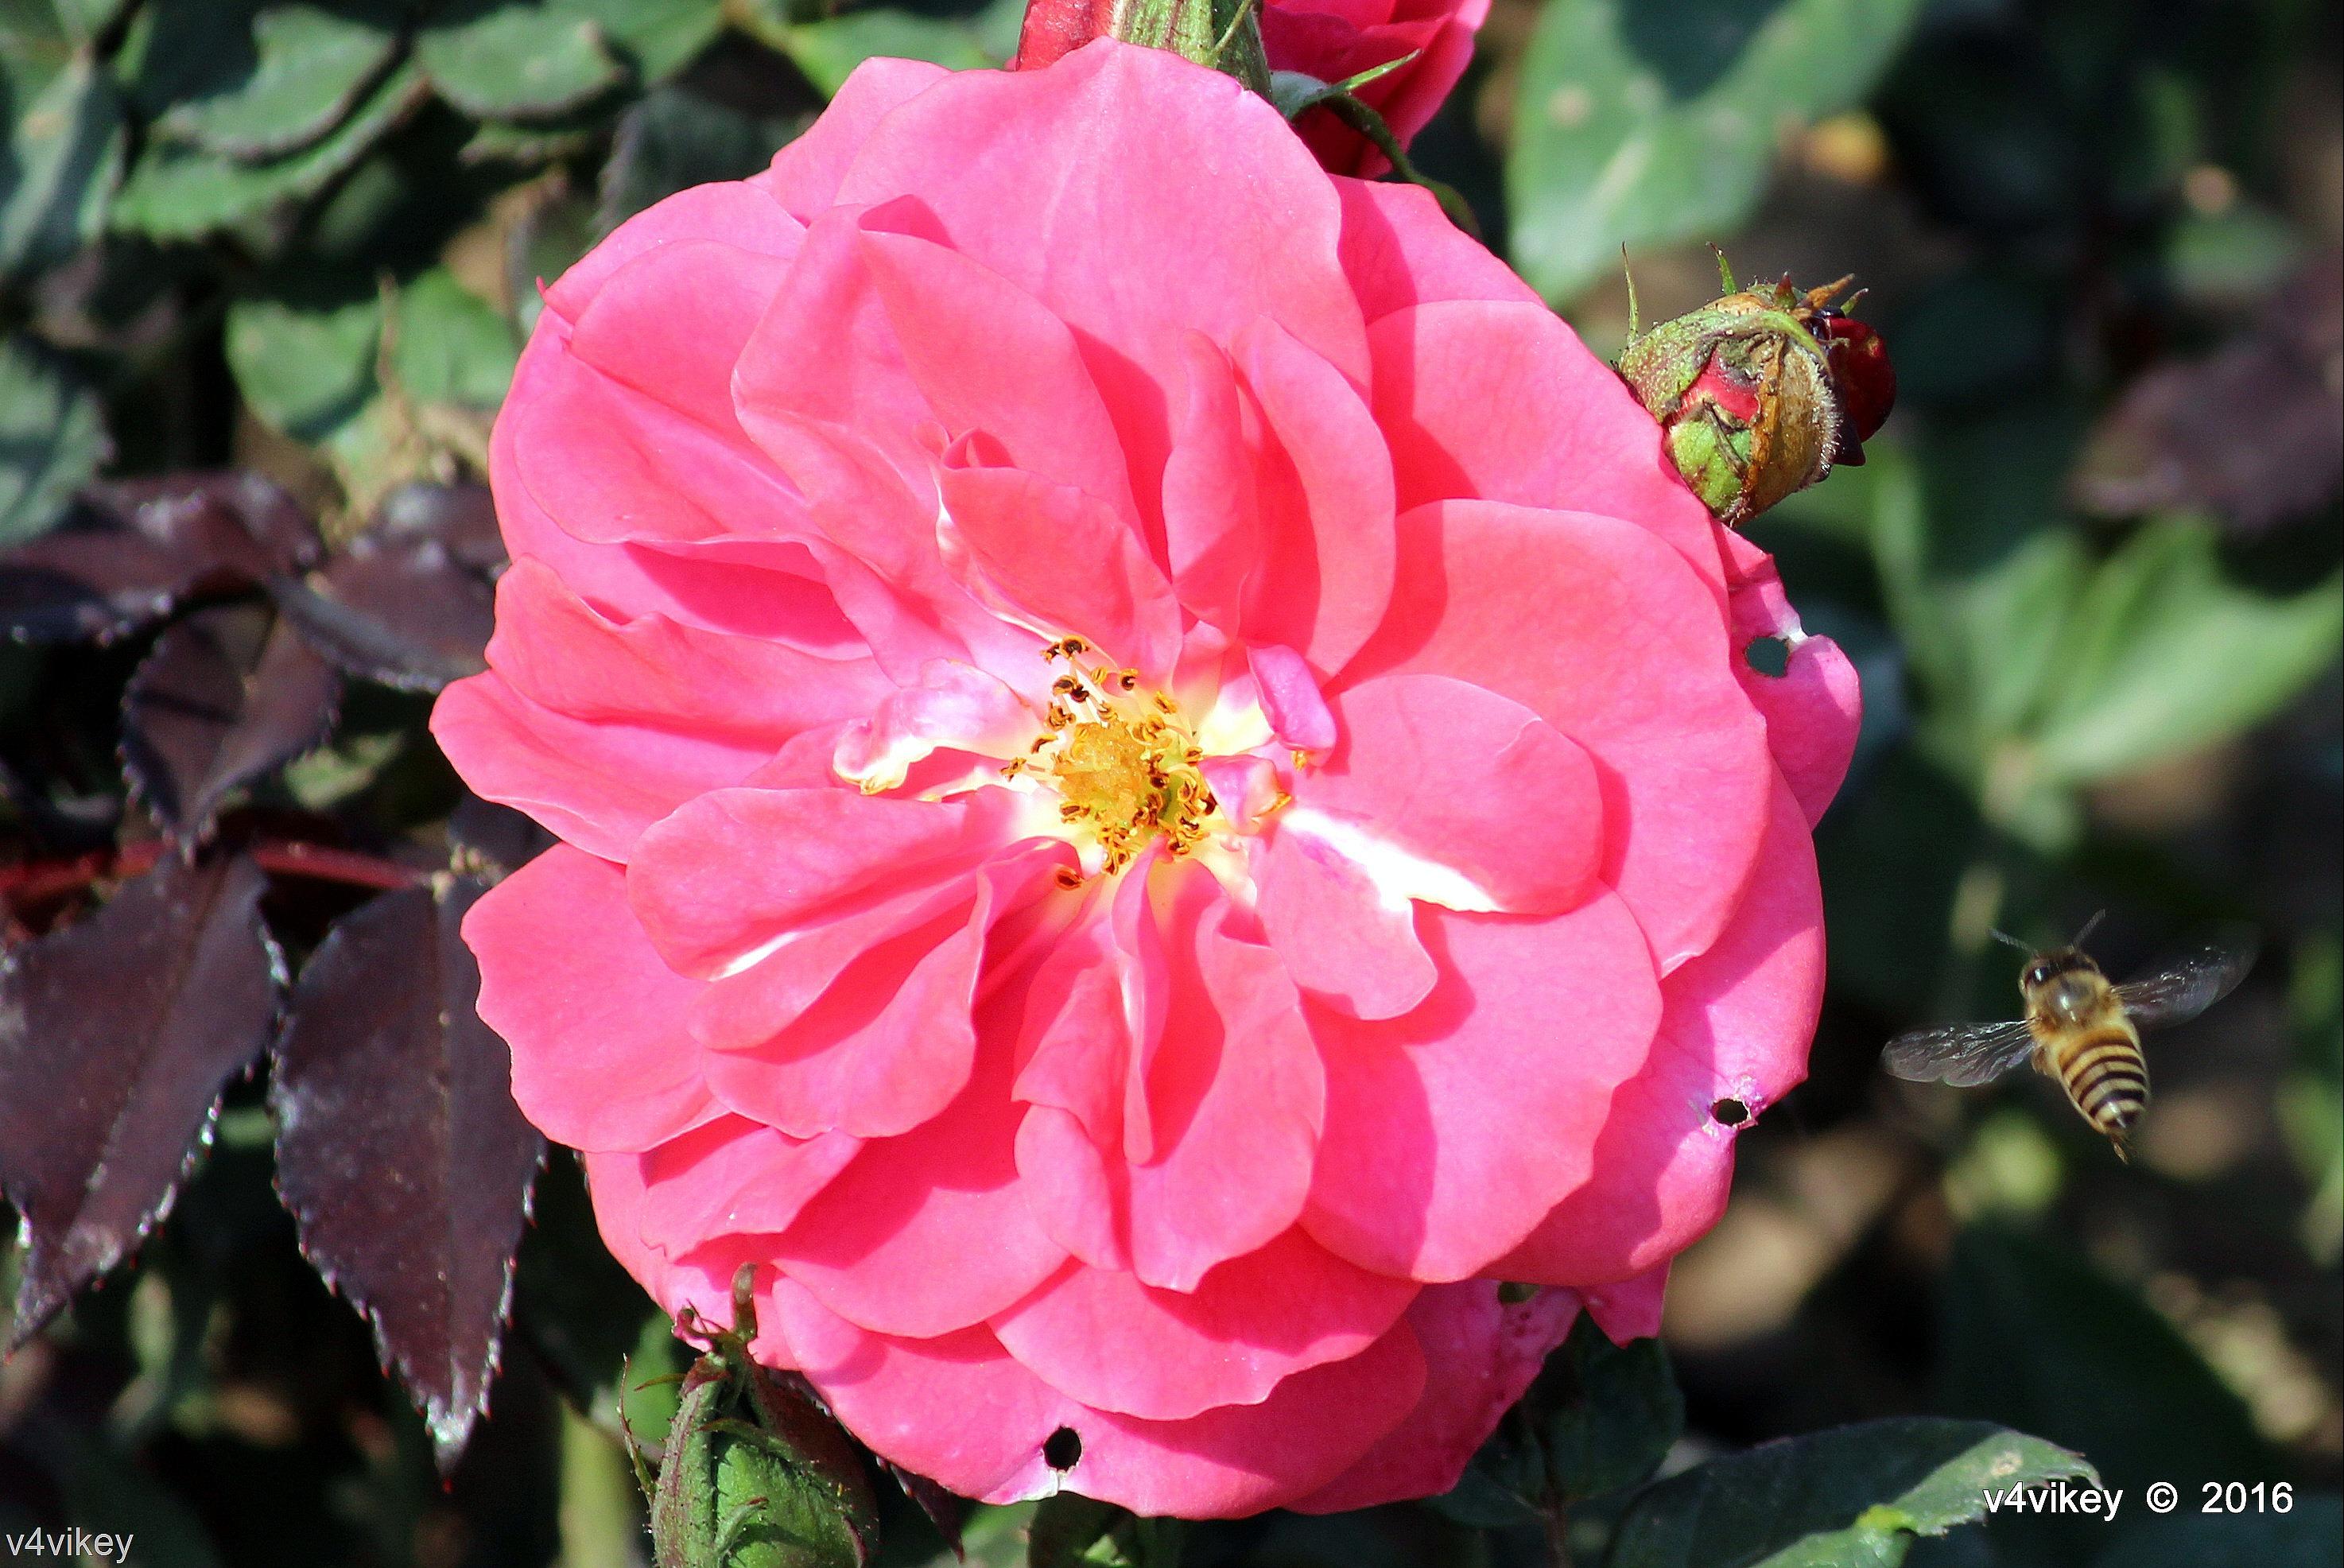 Hot pink balconia rose flower wallpaper wallpaper tadka hot pink balconia rose flower wallpaper mightylinksfo